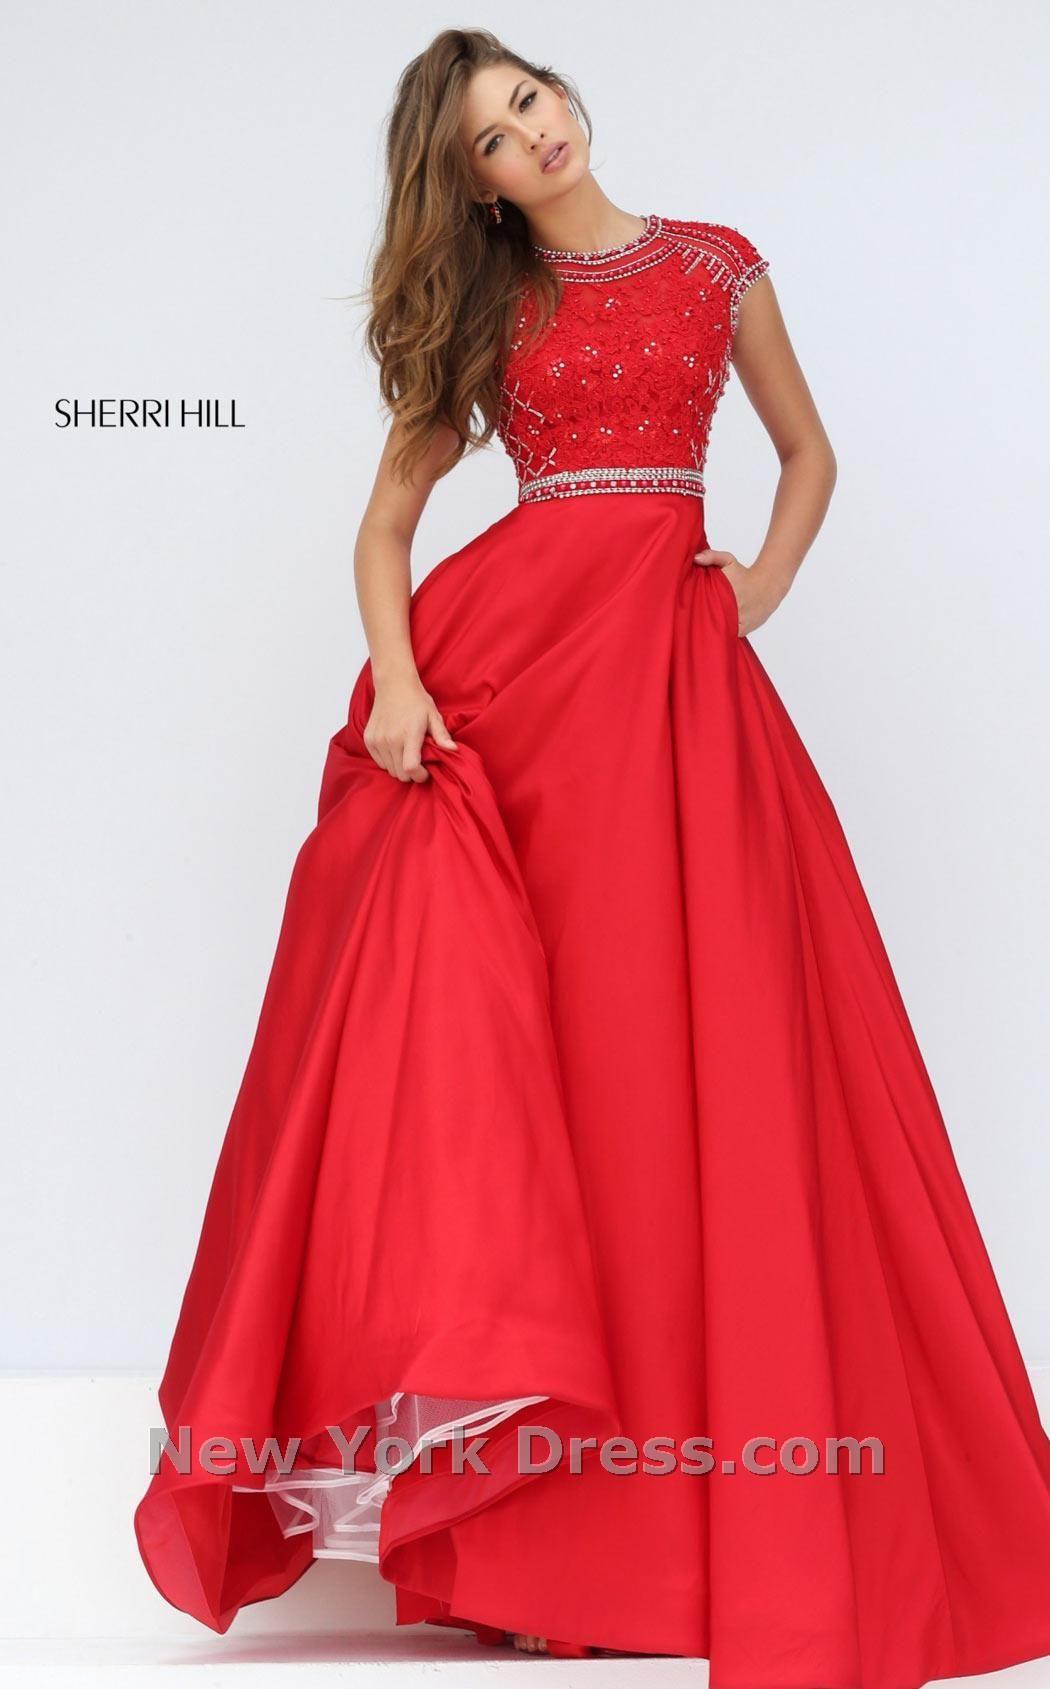 Sherri Hill 32363 Dress - NewYorkDress.com | D R E S S E S | Pinterest